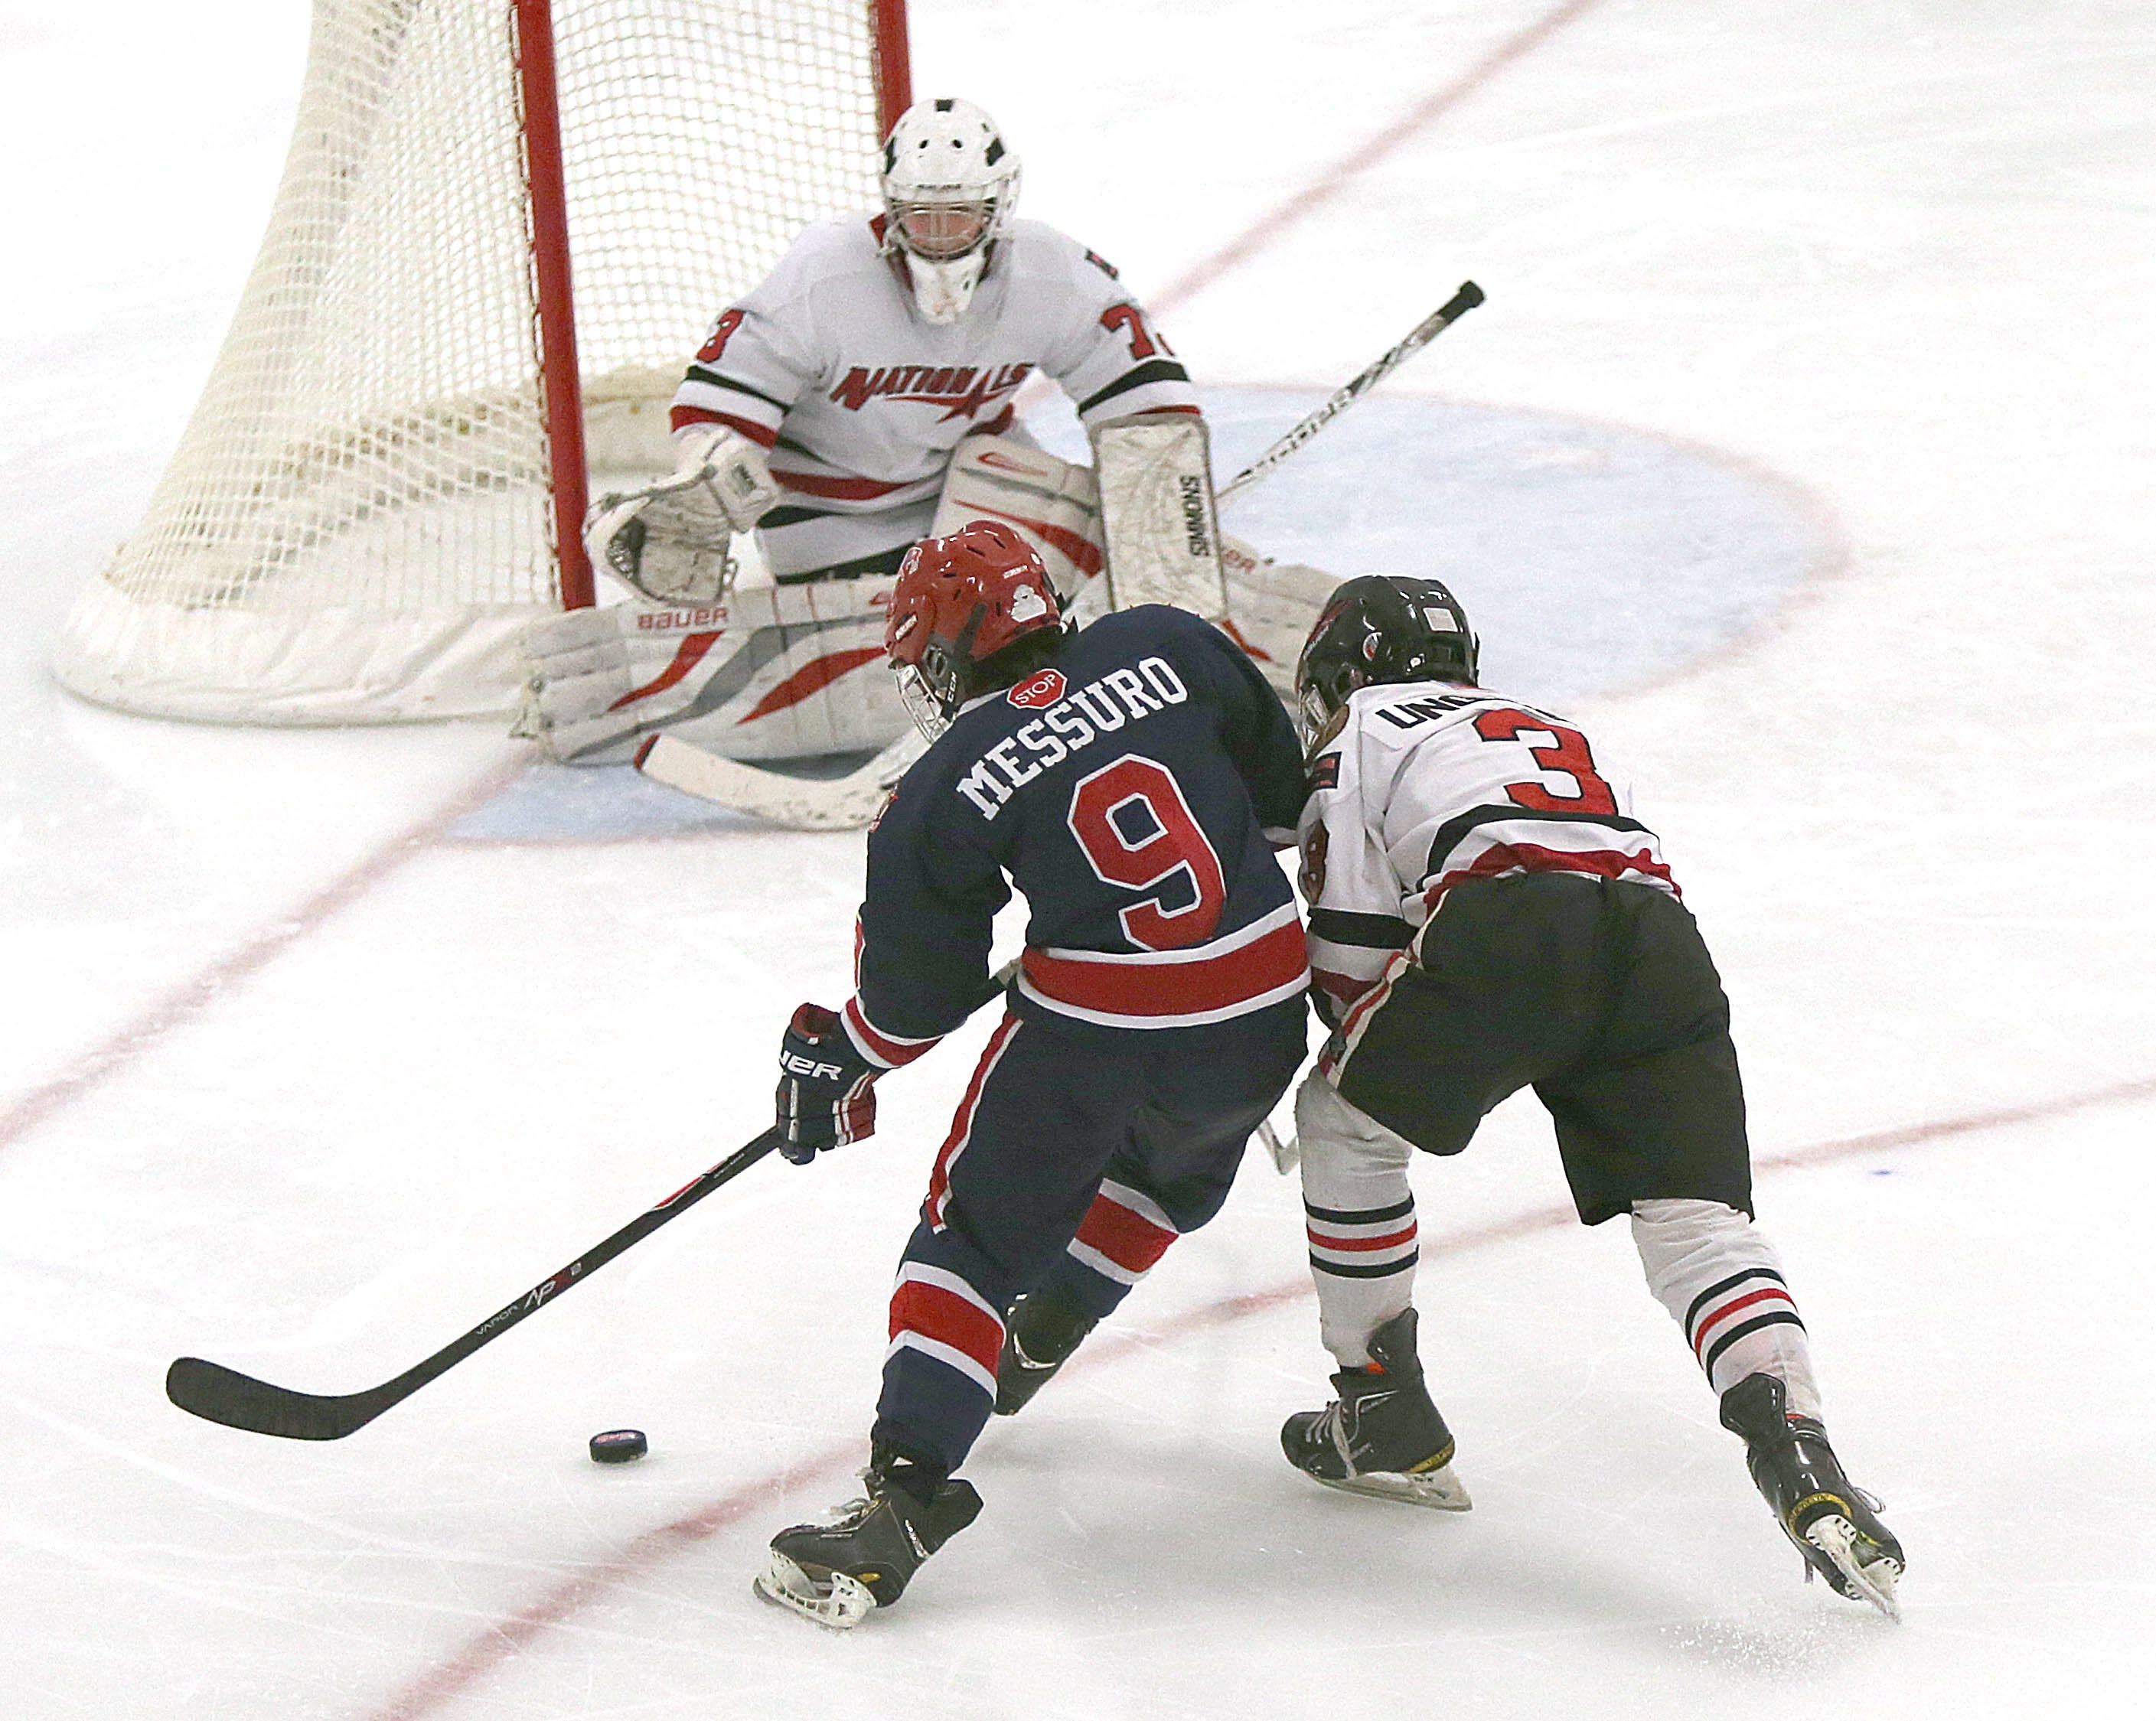 Buffalo Regals 12-under team member Nick Messuro (9) goes to the net against Syracuse goalie Michael Lenhart and defensman Logan Ungleich.